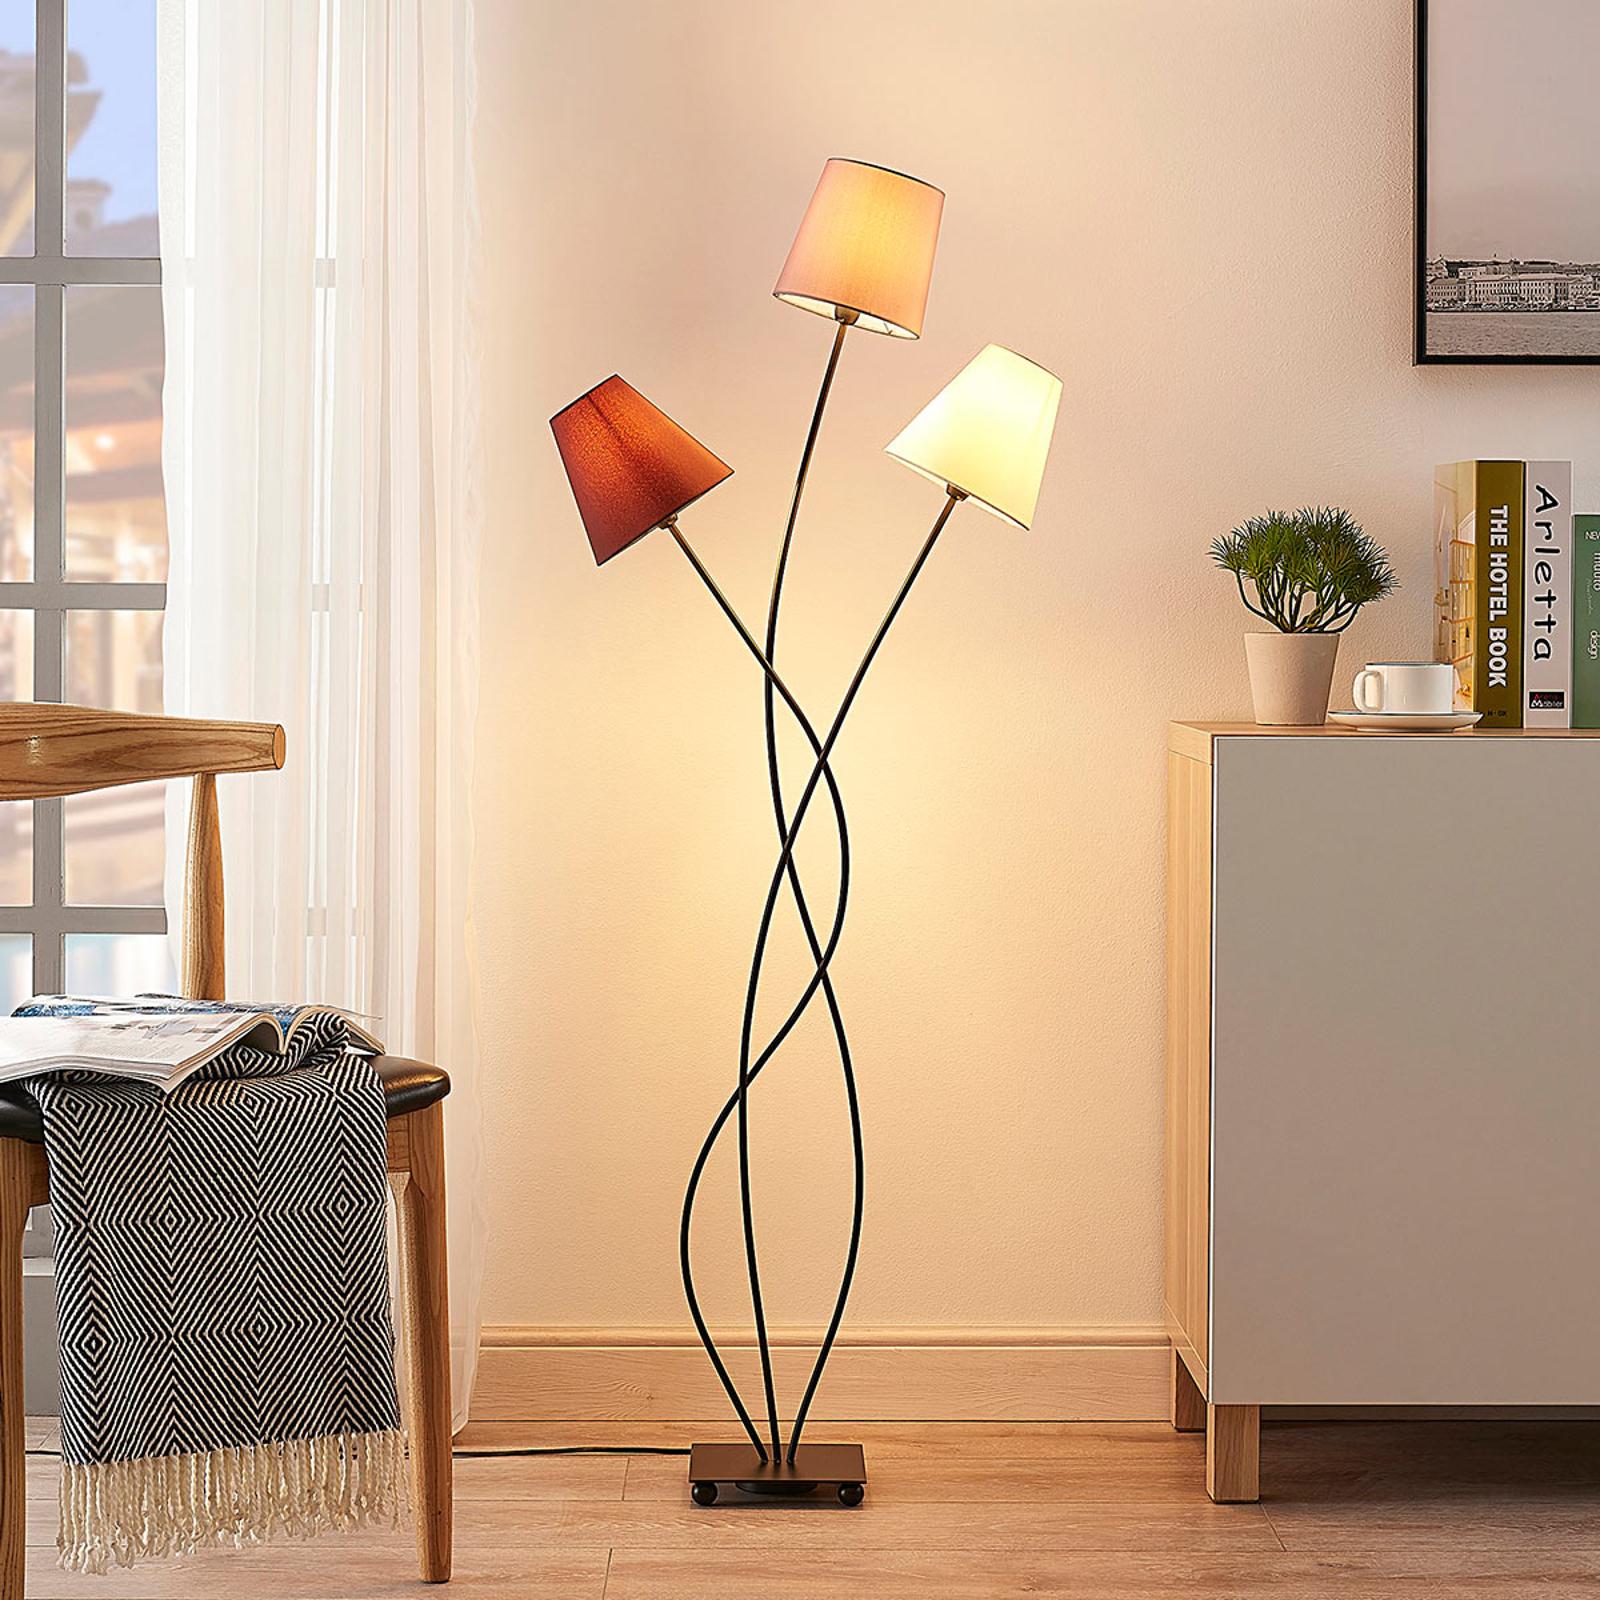 Vloerlamp Melis met stoffen kappen en drie lampen